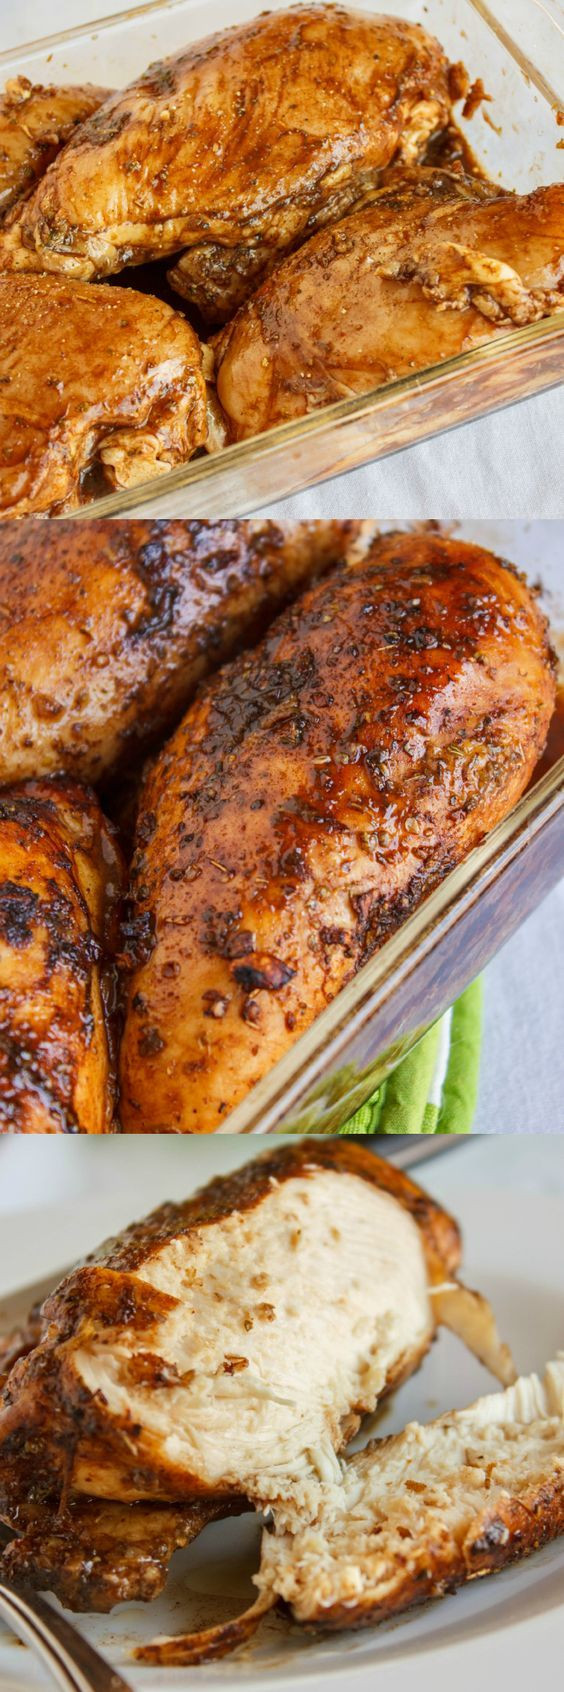 Roasted Boneless Chicken Breast  Baked Balsamic Chicken Recipe